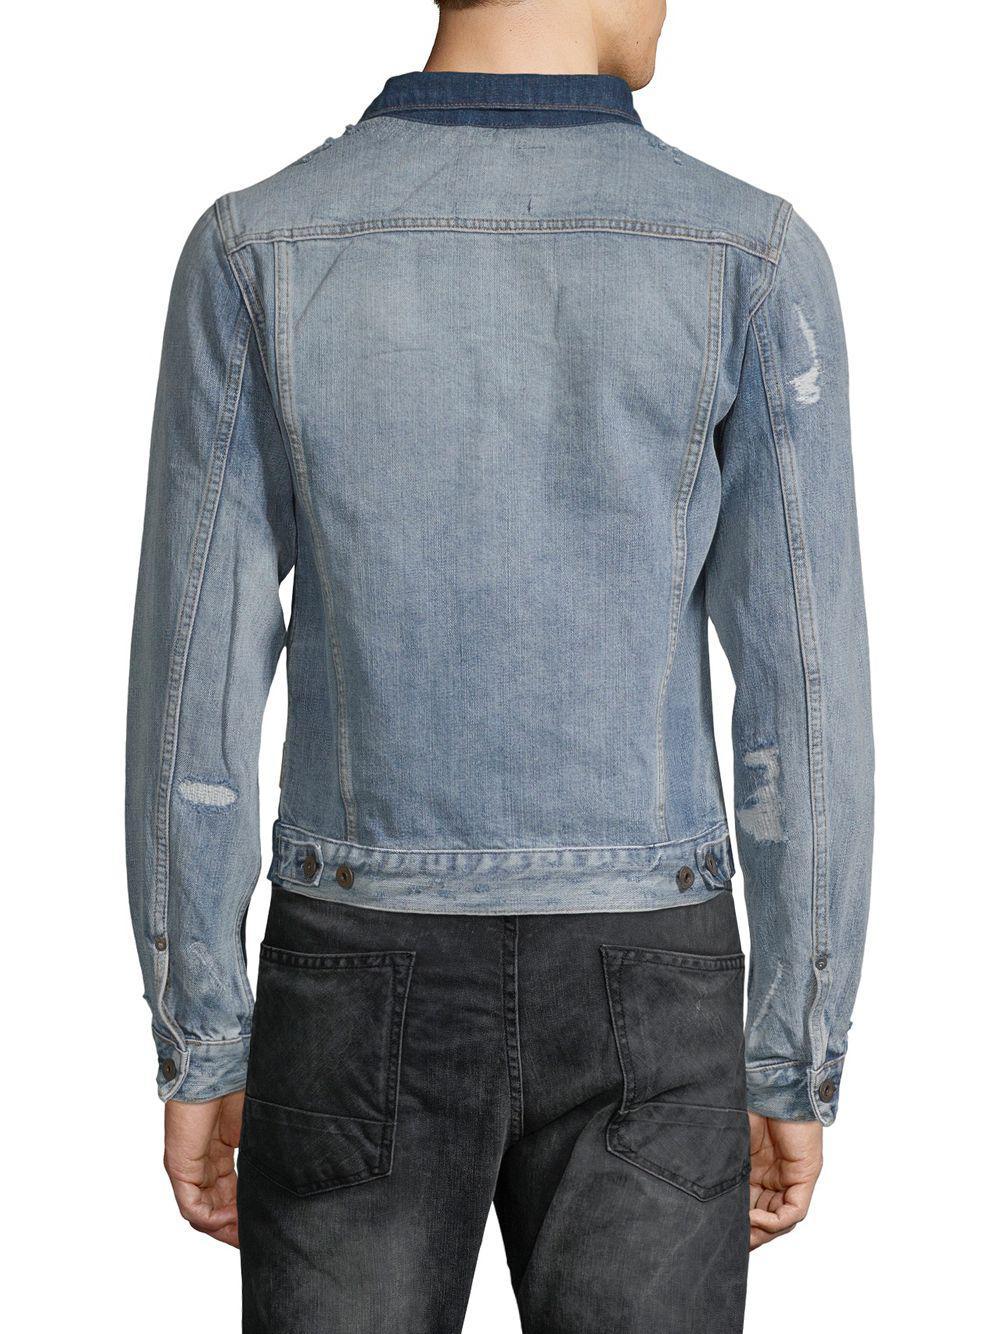 b807aa5dd1a ... Blue Heroes Customized Denim Jacket for Men - Lyst. View fullscreen